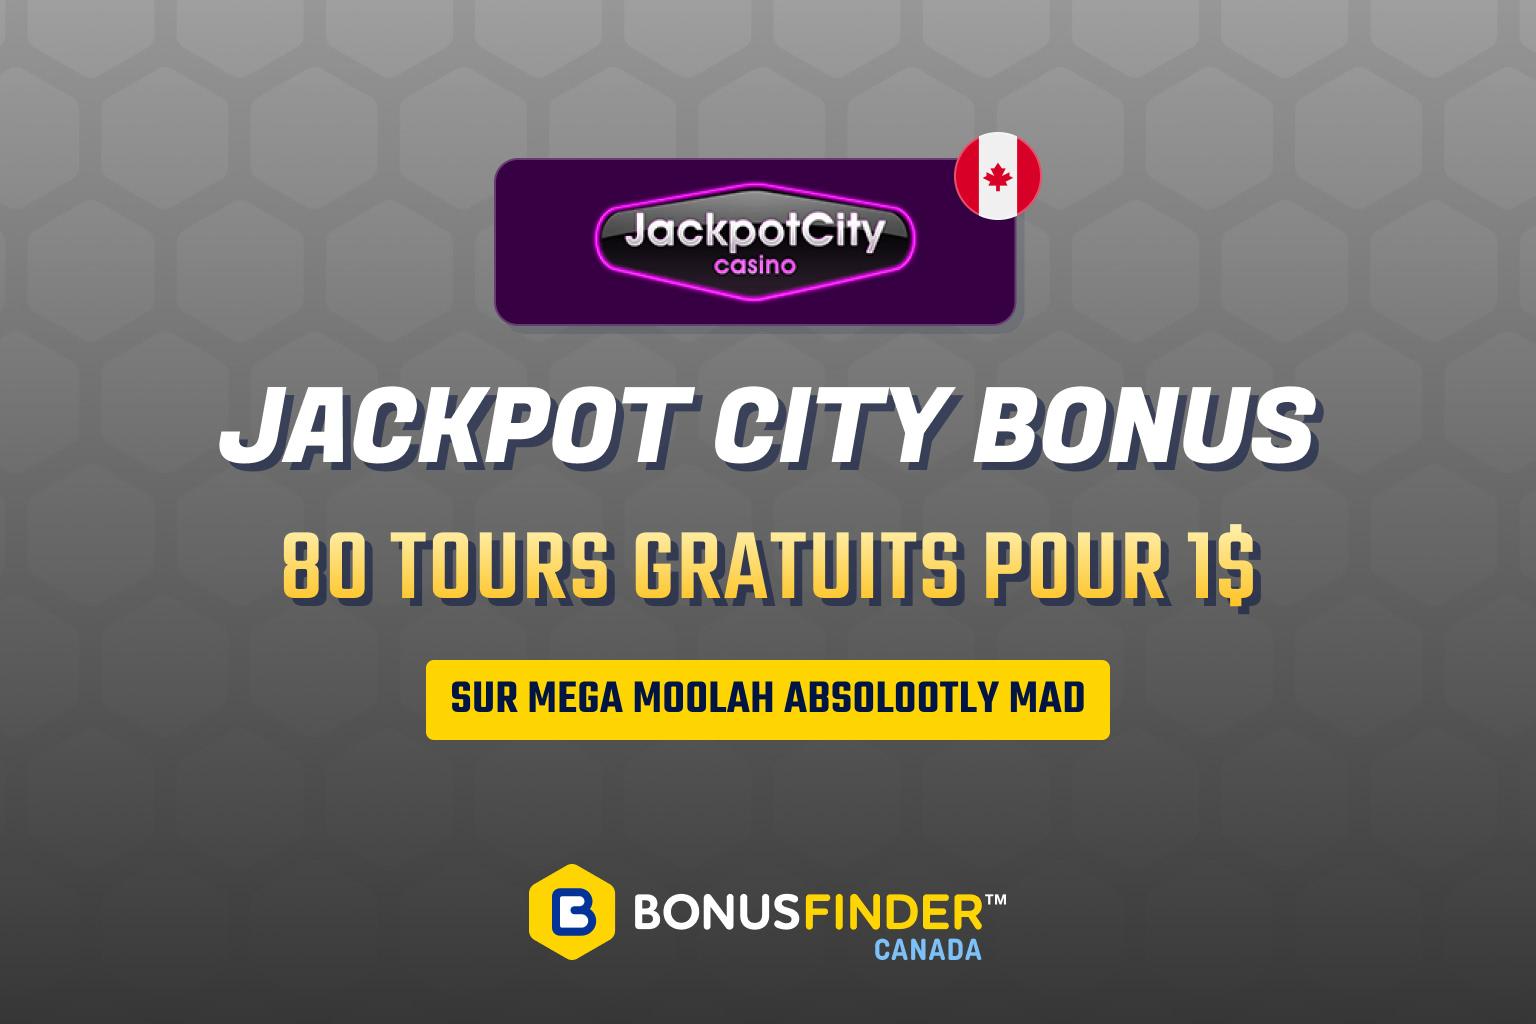 jackpot city bonus 1$